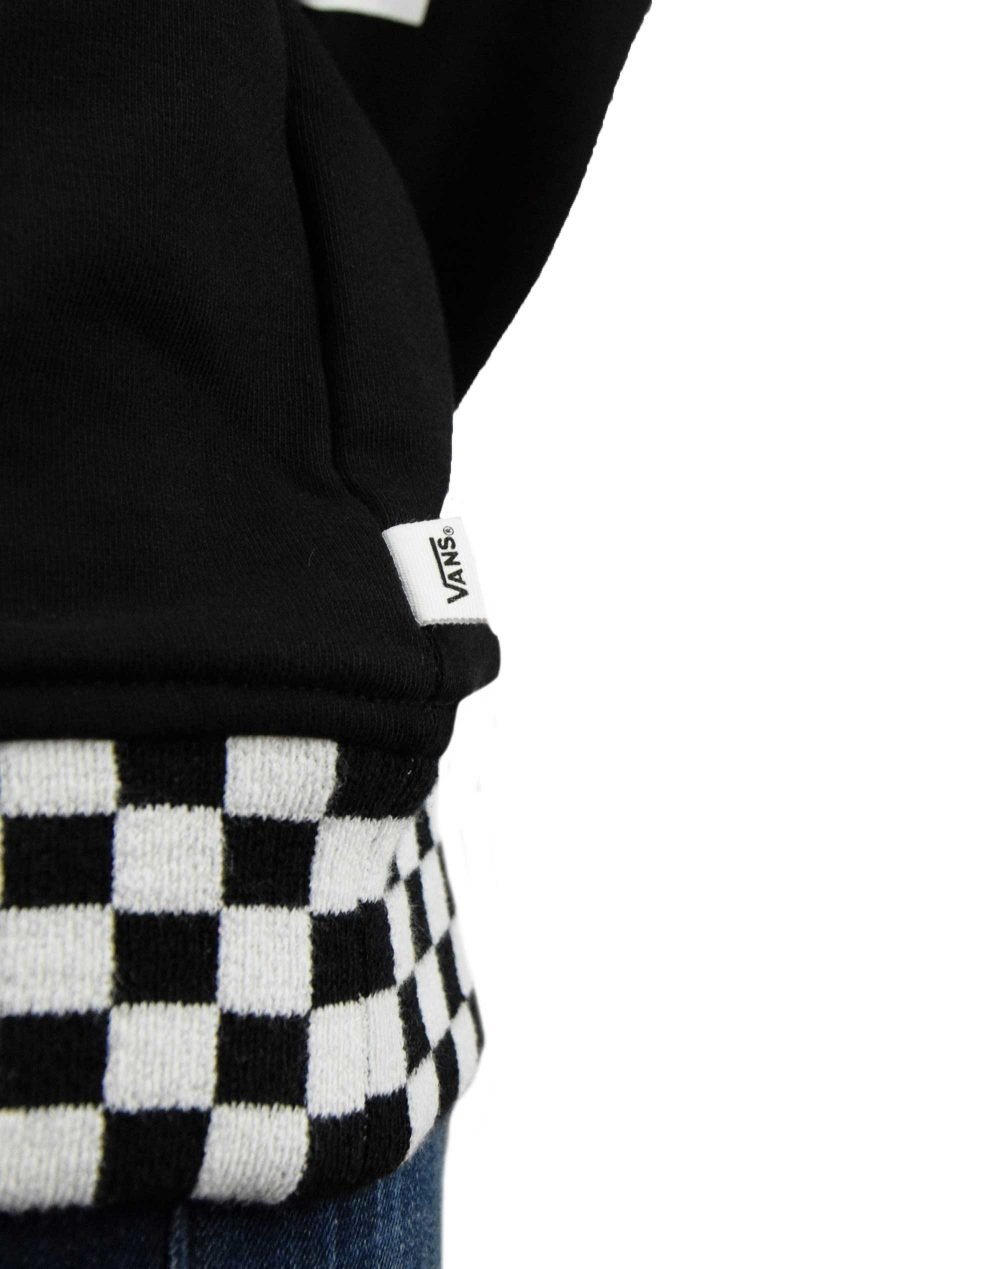 Vans Centrl Hoodie Black (VA4BQSBLK)